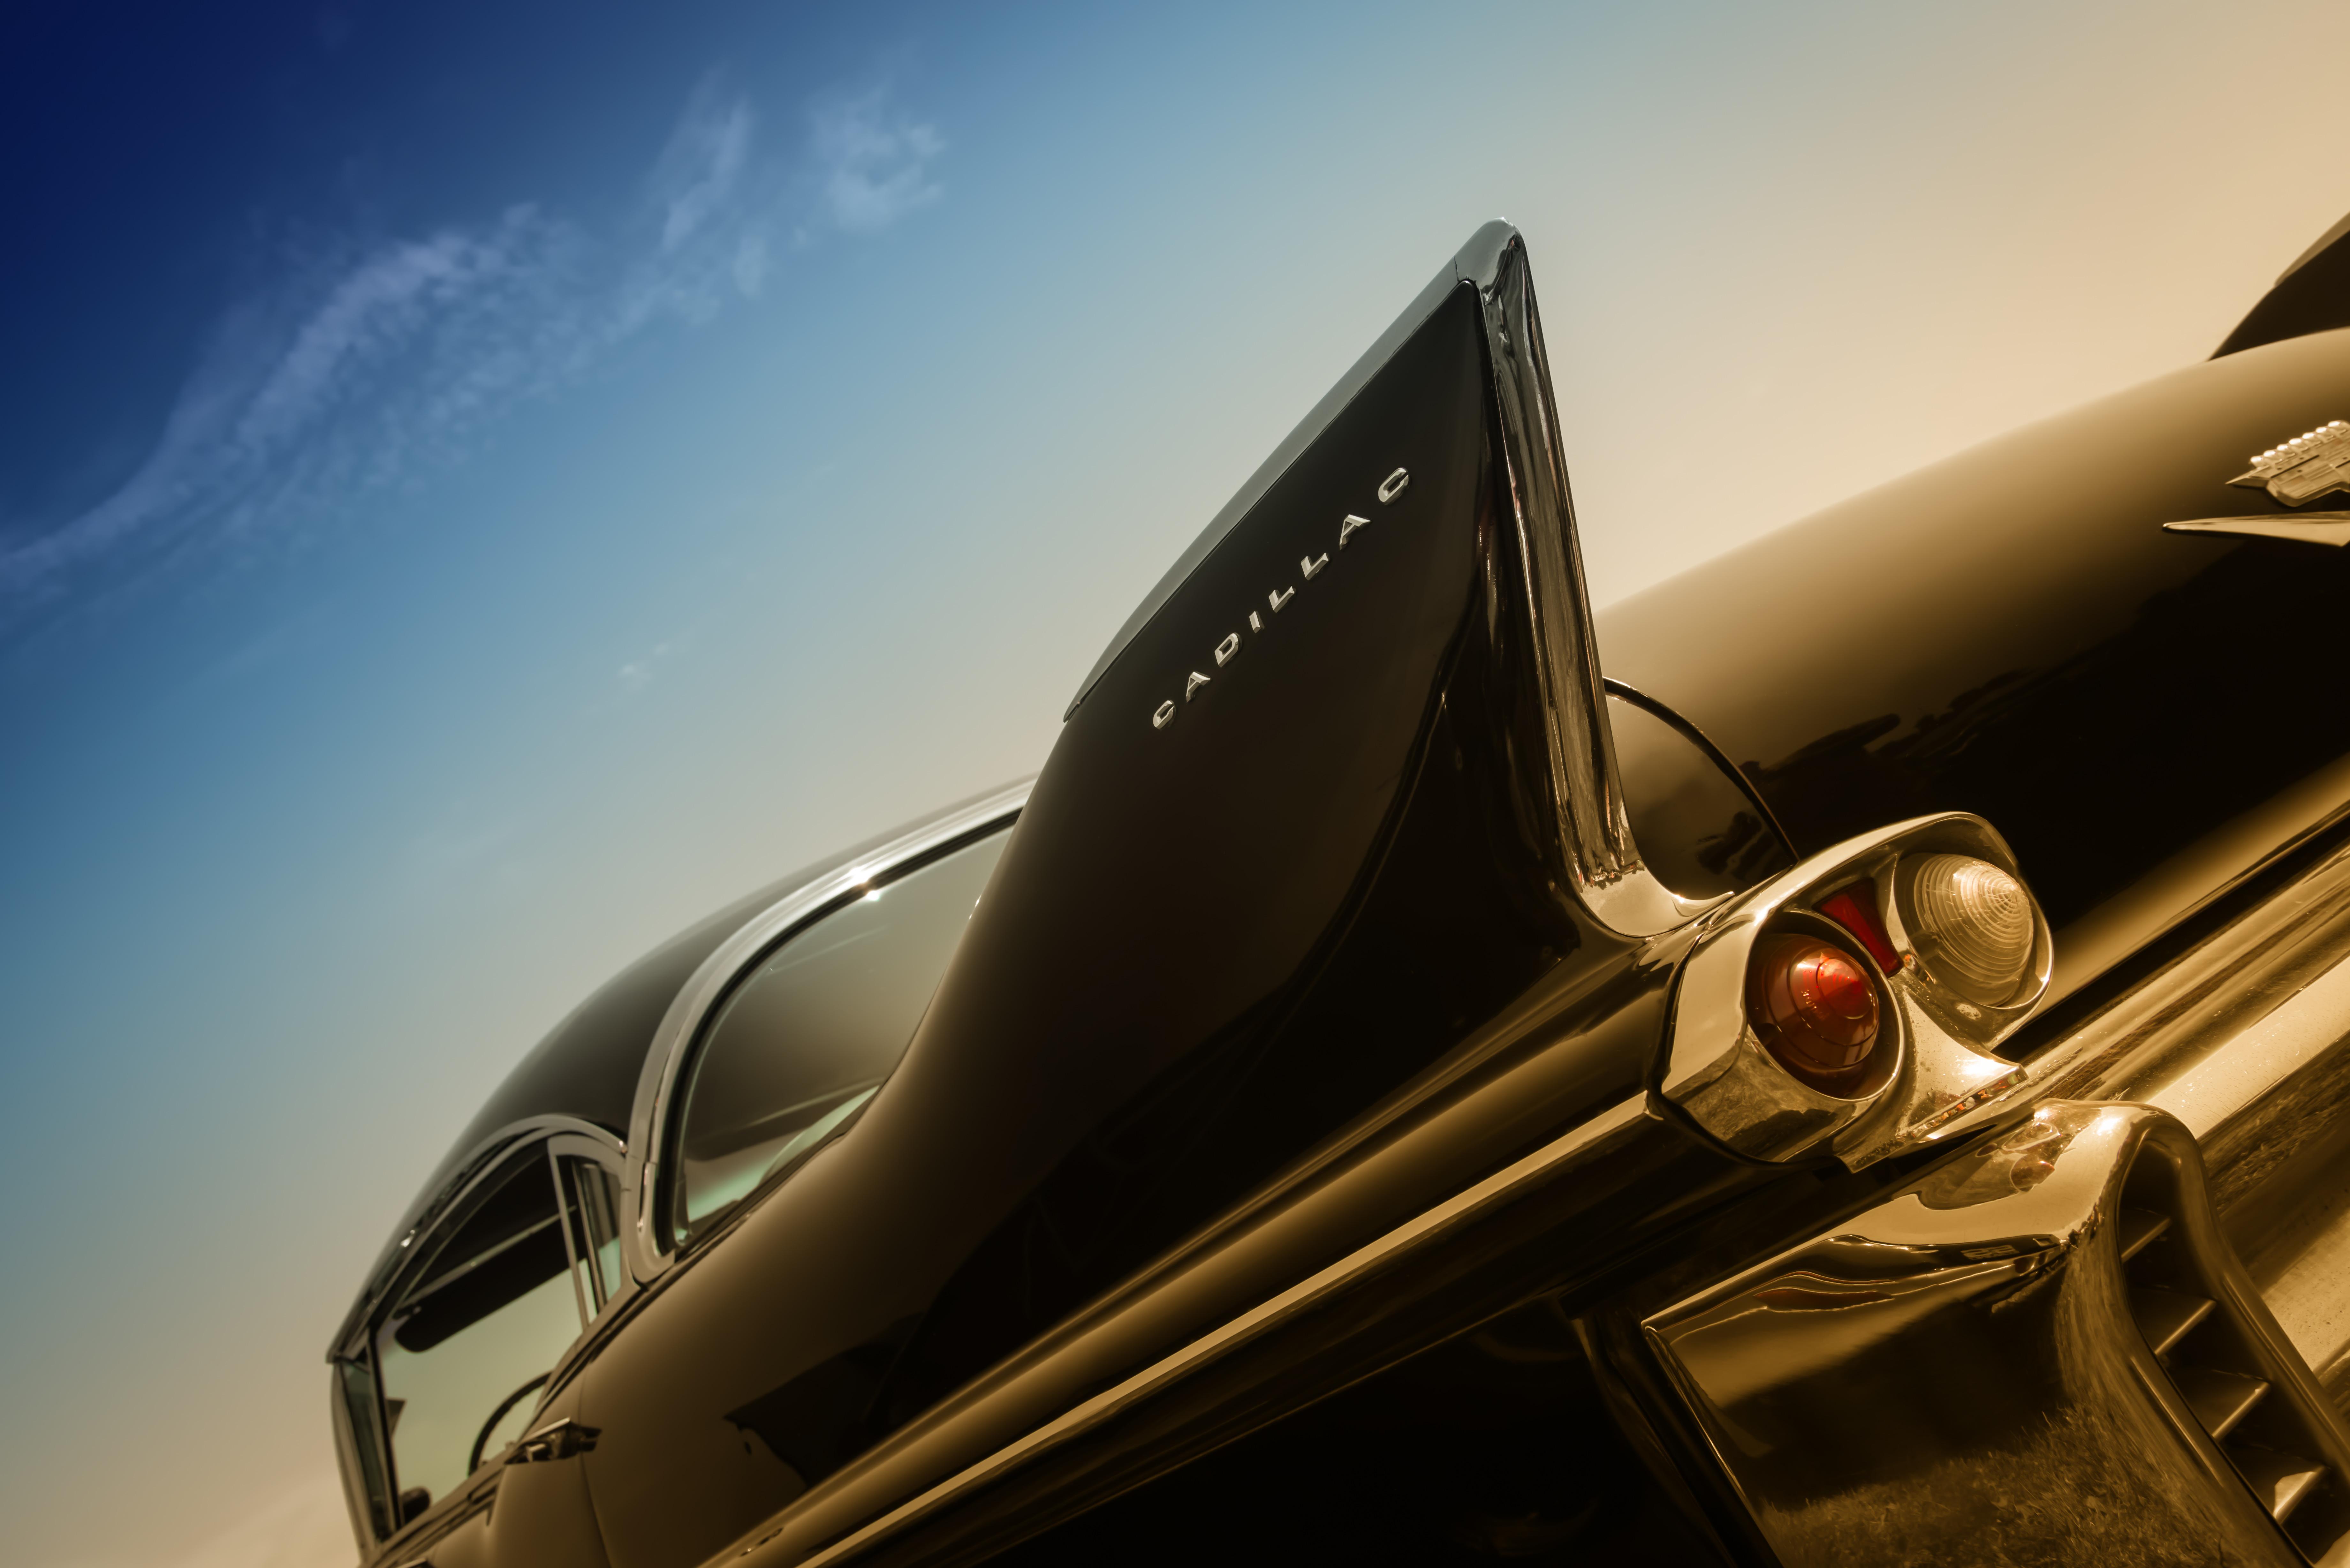 Apocalyptic Cadillac